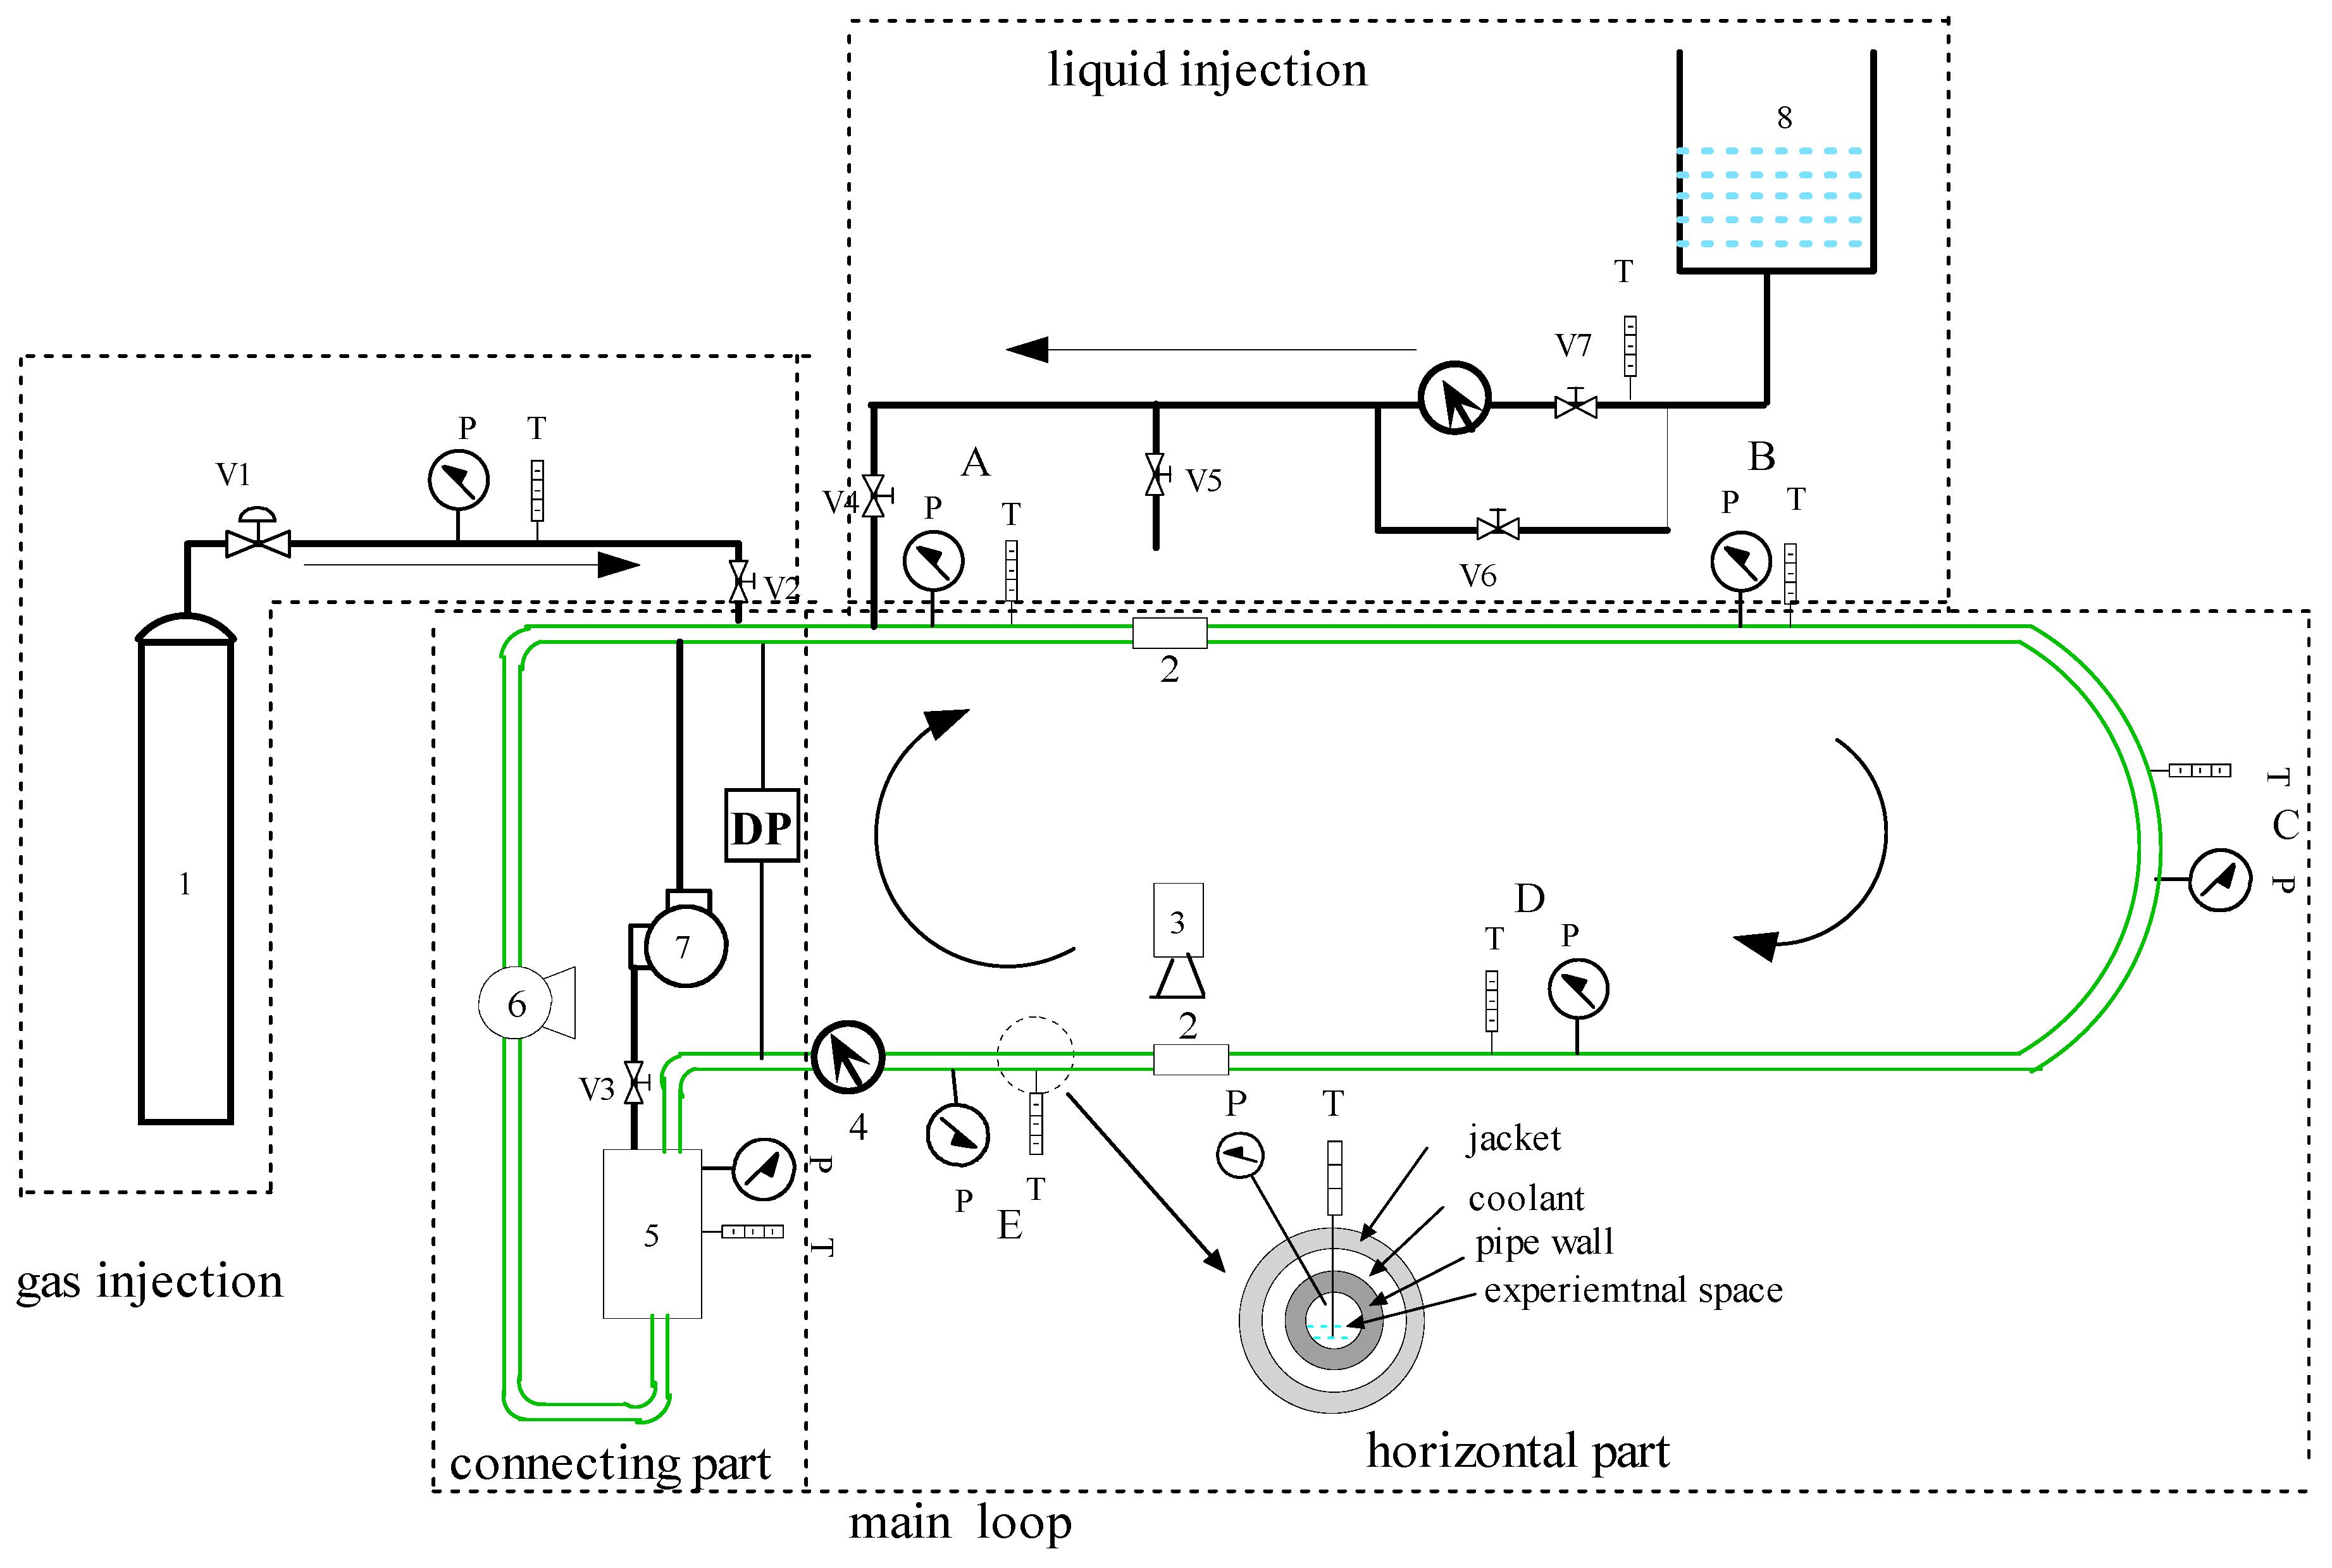 Meter Loop Diagram Online Schematics Residential Electrical Wiring Gas Trusted Diagrams Energies Free Full Text